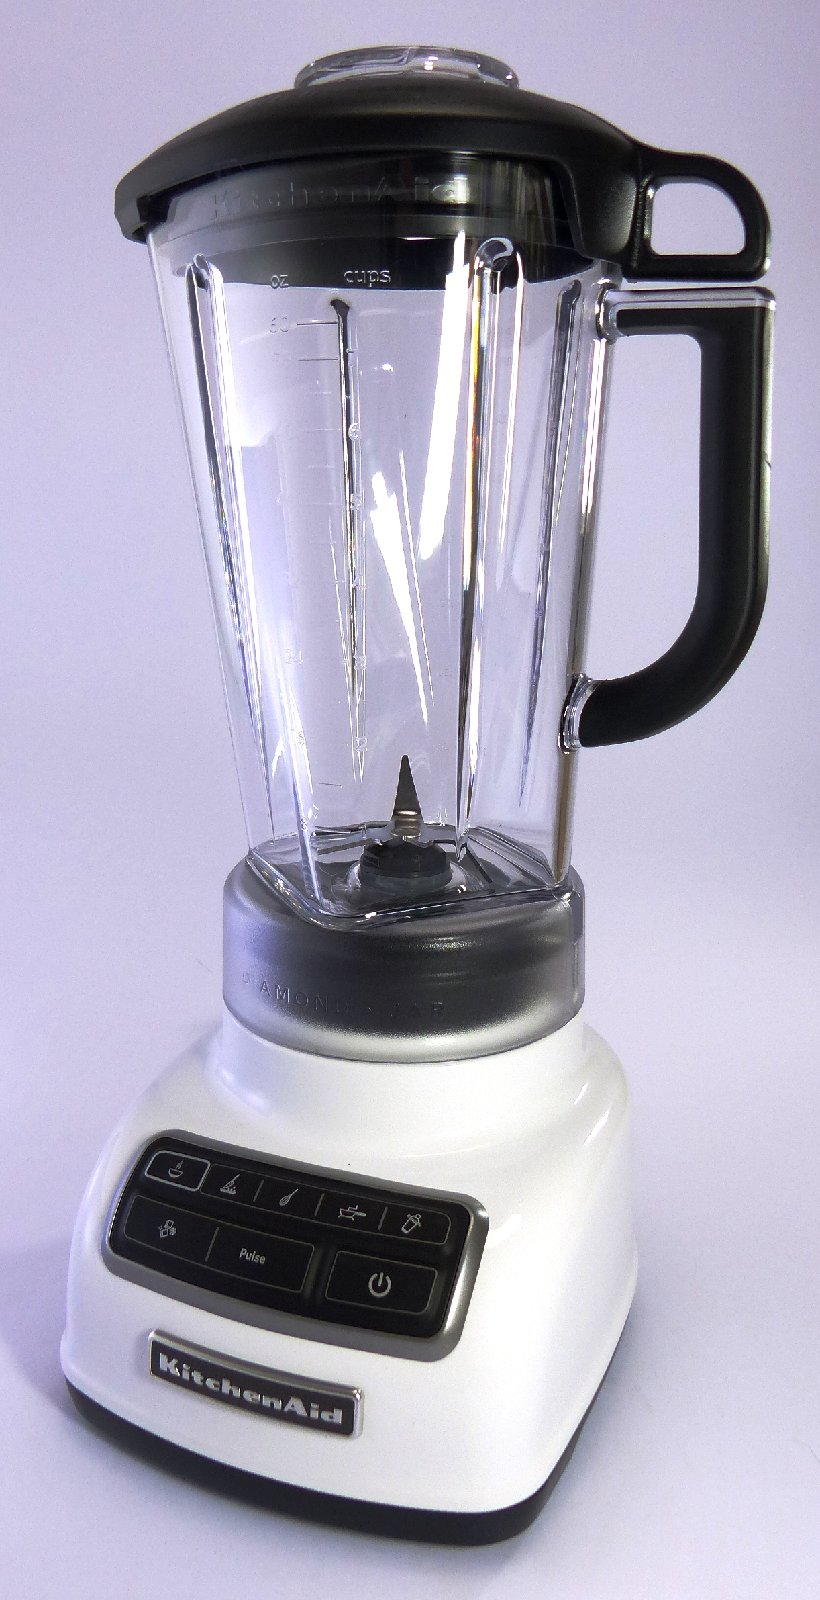 kitchenaid classic standmixer diamond blender mixer 1 75l. Black Bedroom Furniture Sets. Home Design Ideas